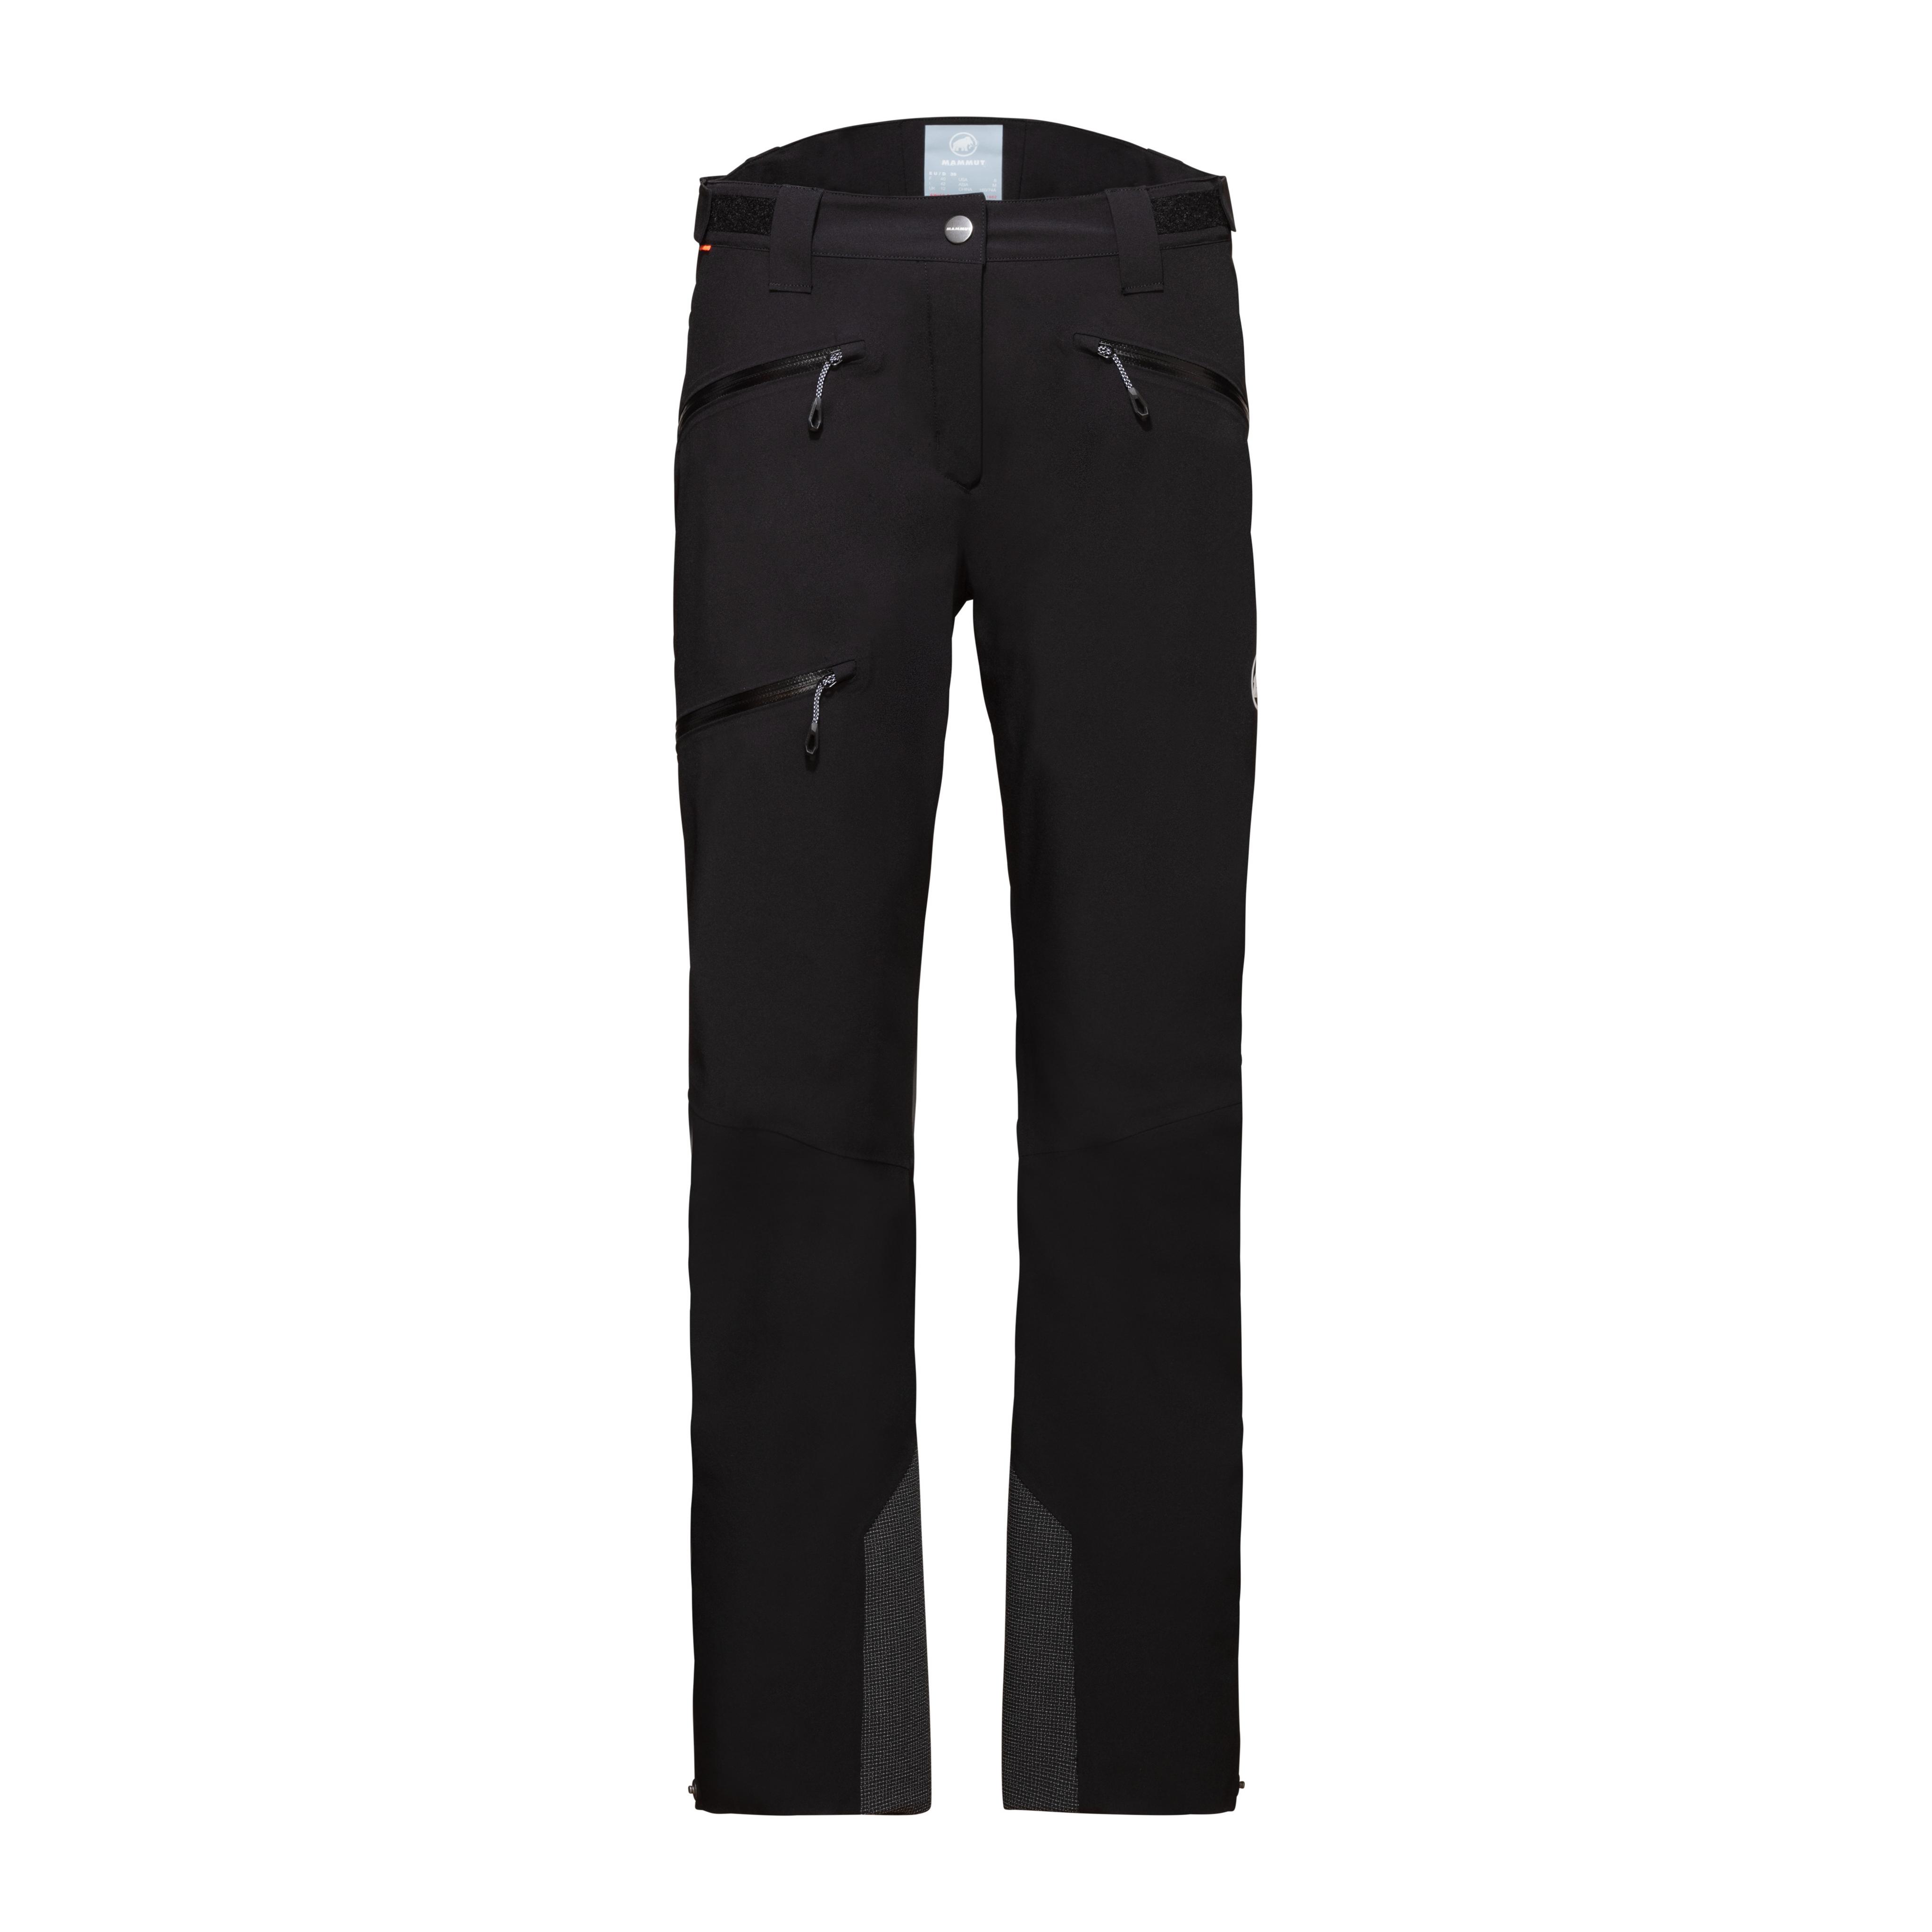 Stoney HS Pants Women - black-white, normal, UK 6 thumbnail